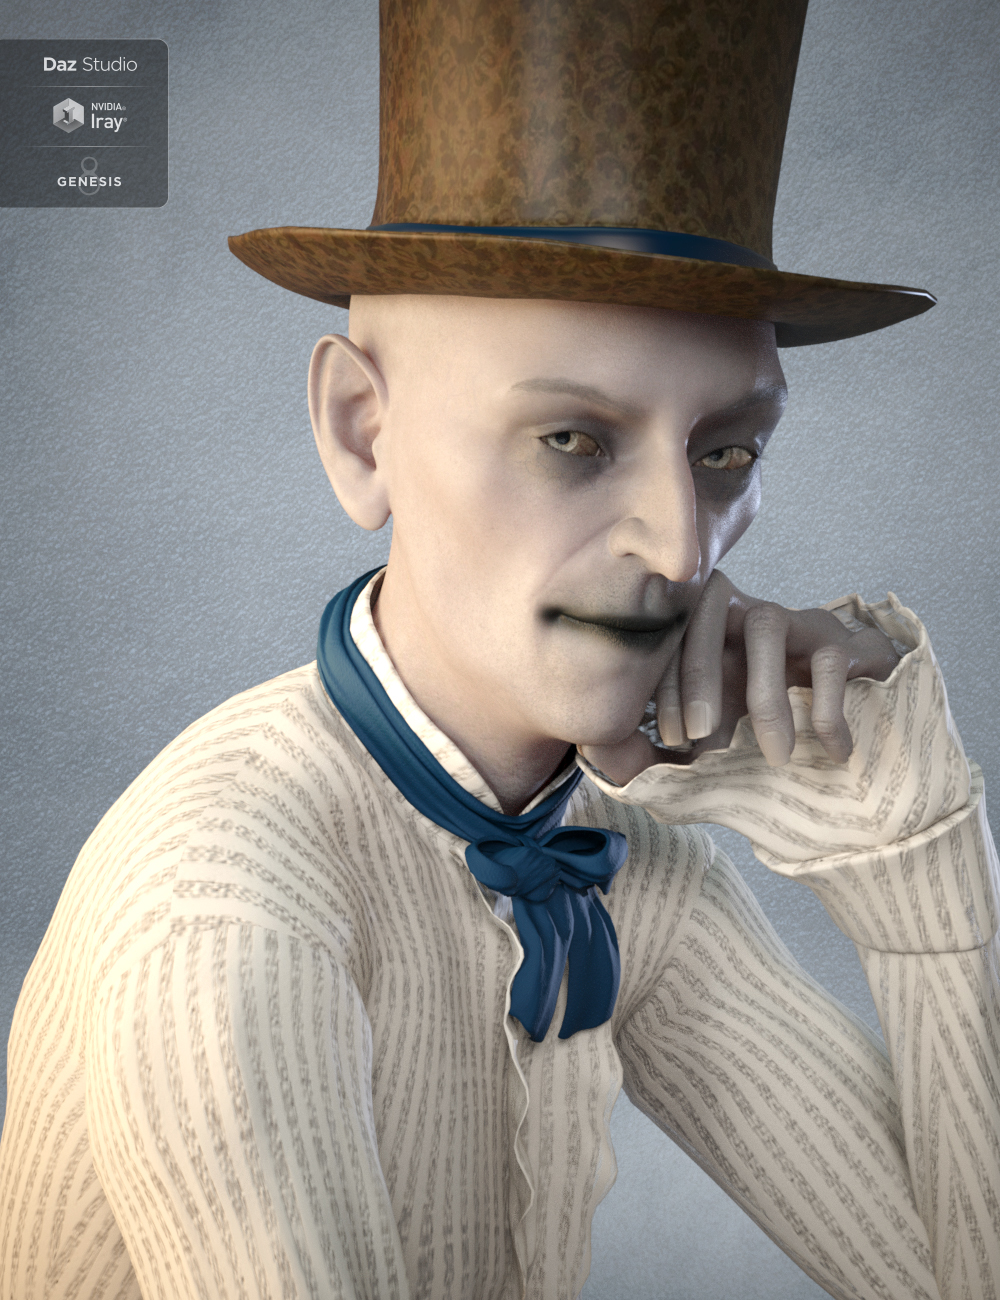 Zackyr for Ollie 8 by: Eva1, 3D Models by Daz 3D